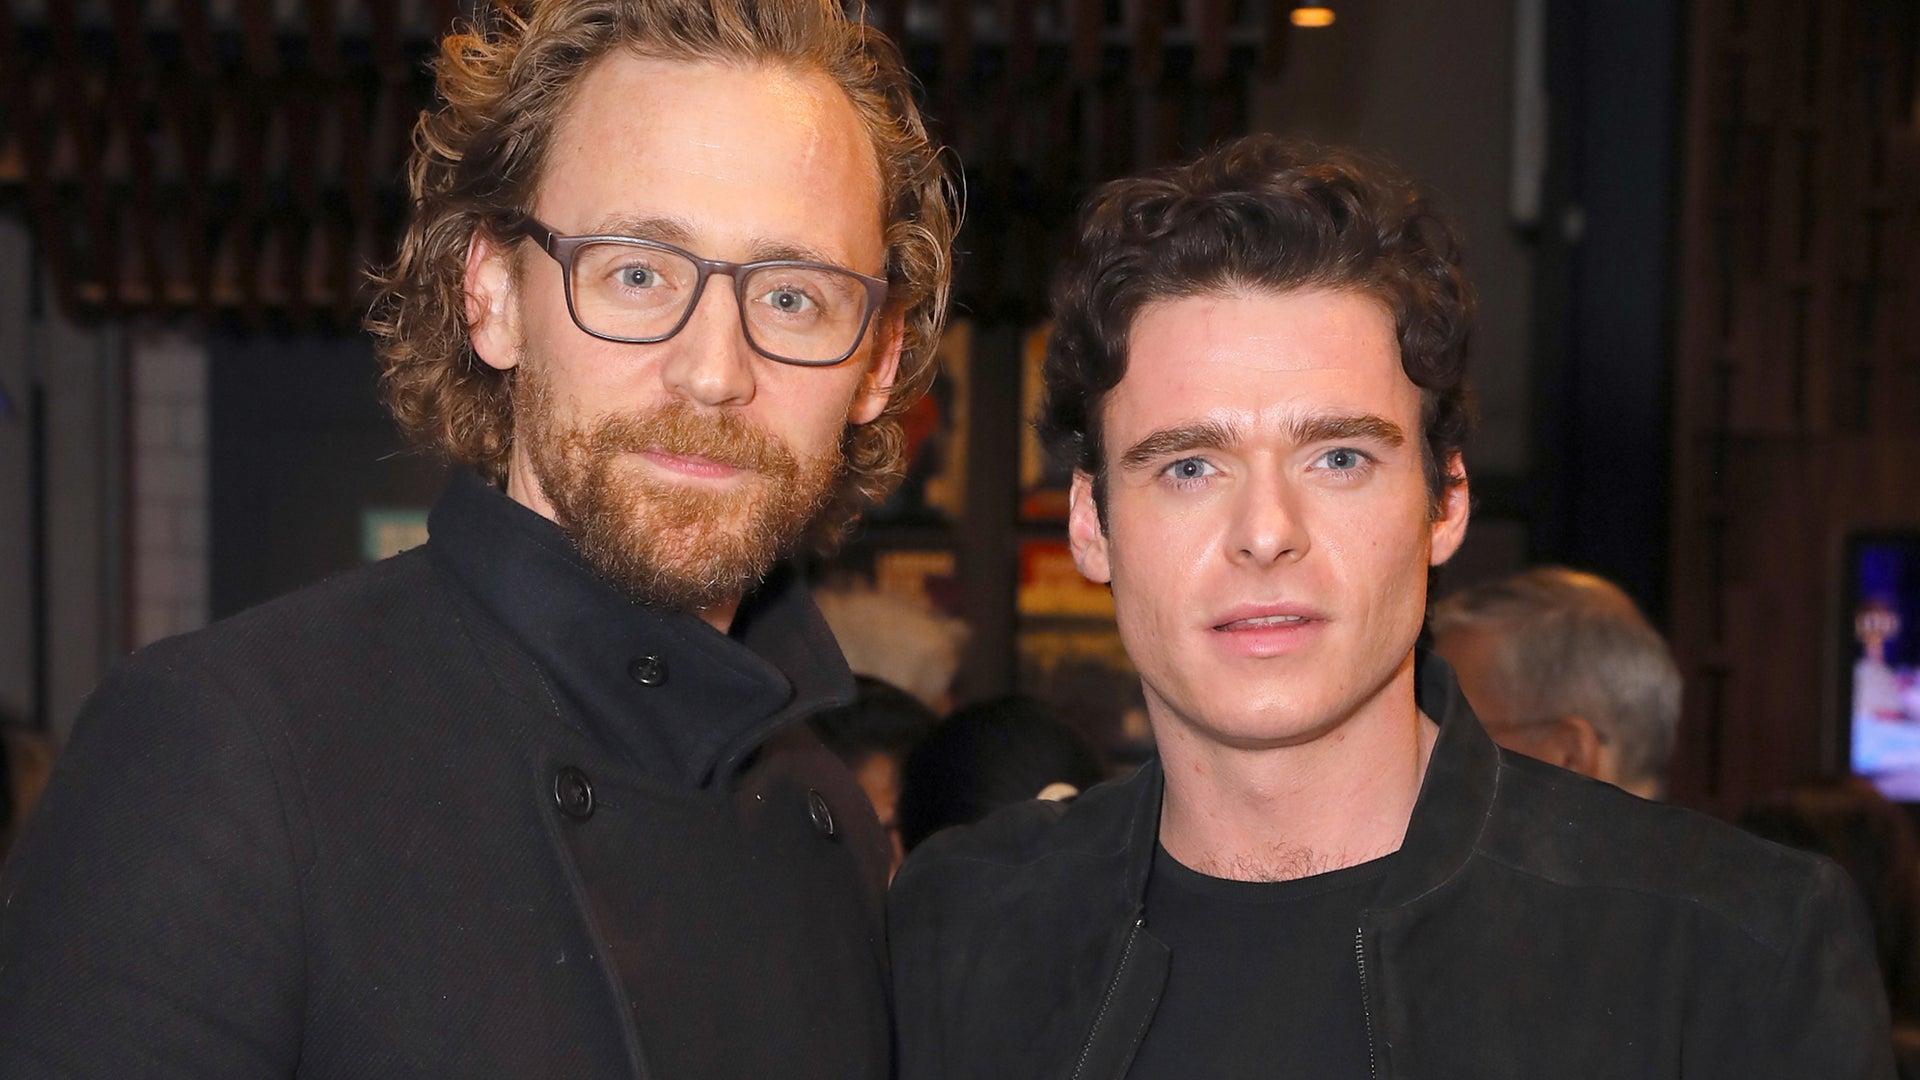 Tom Hiddleston and Richard Madden